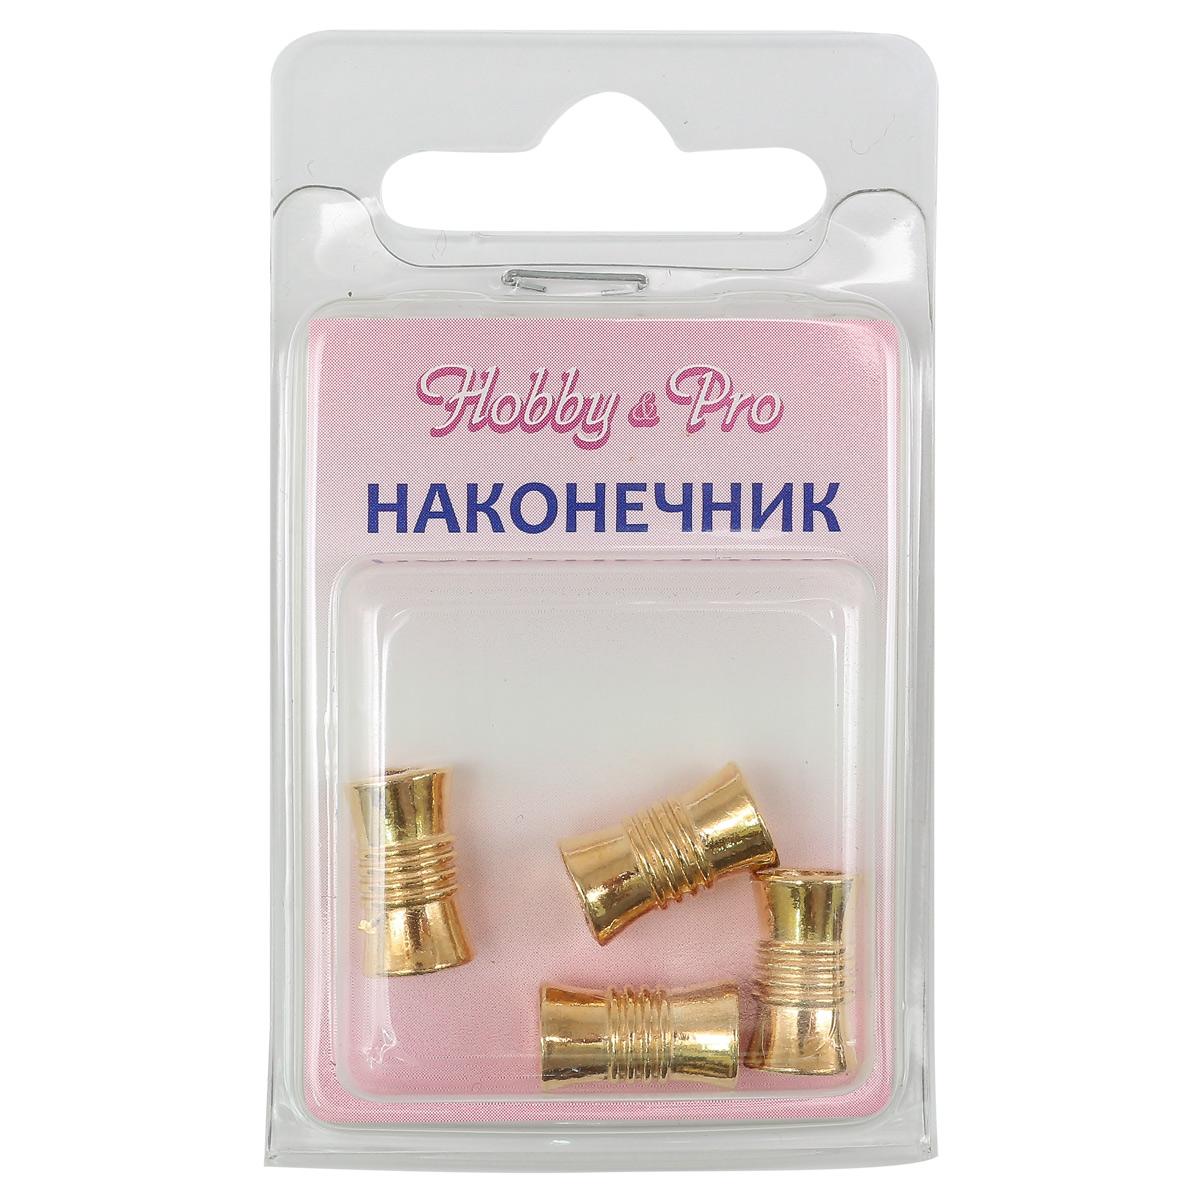 0305-5012 Наконечник 'Цилиндр' d=3/5мм, 12*7мм, 4шт, металл Hobby&Pro